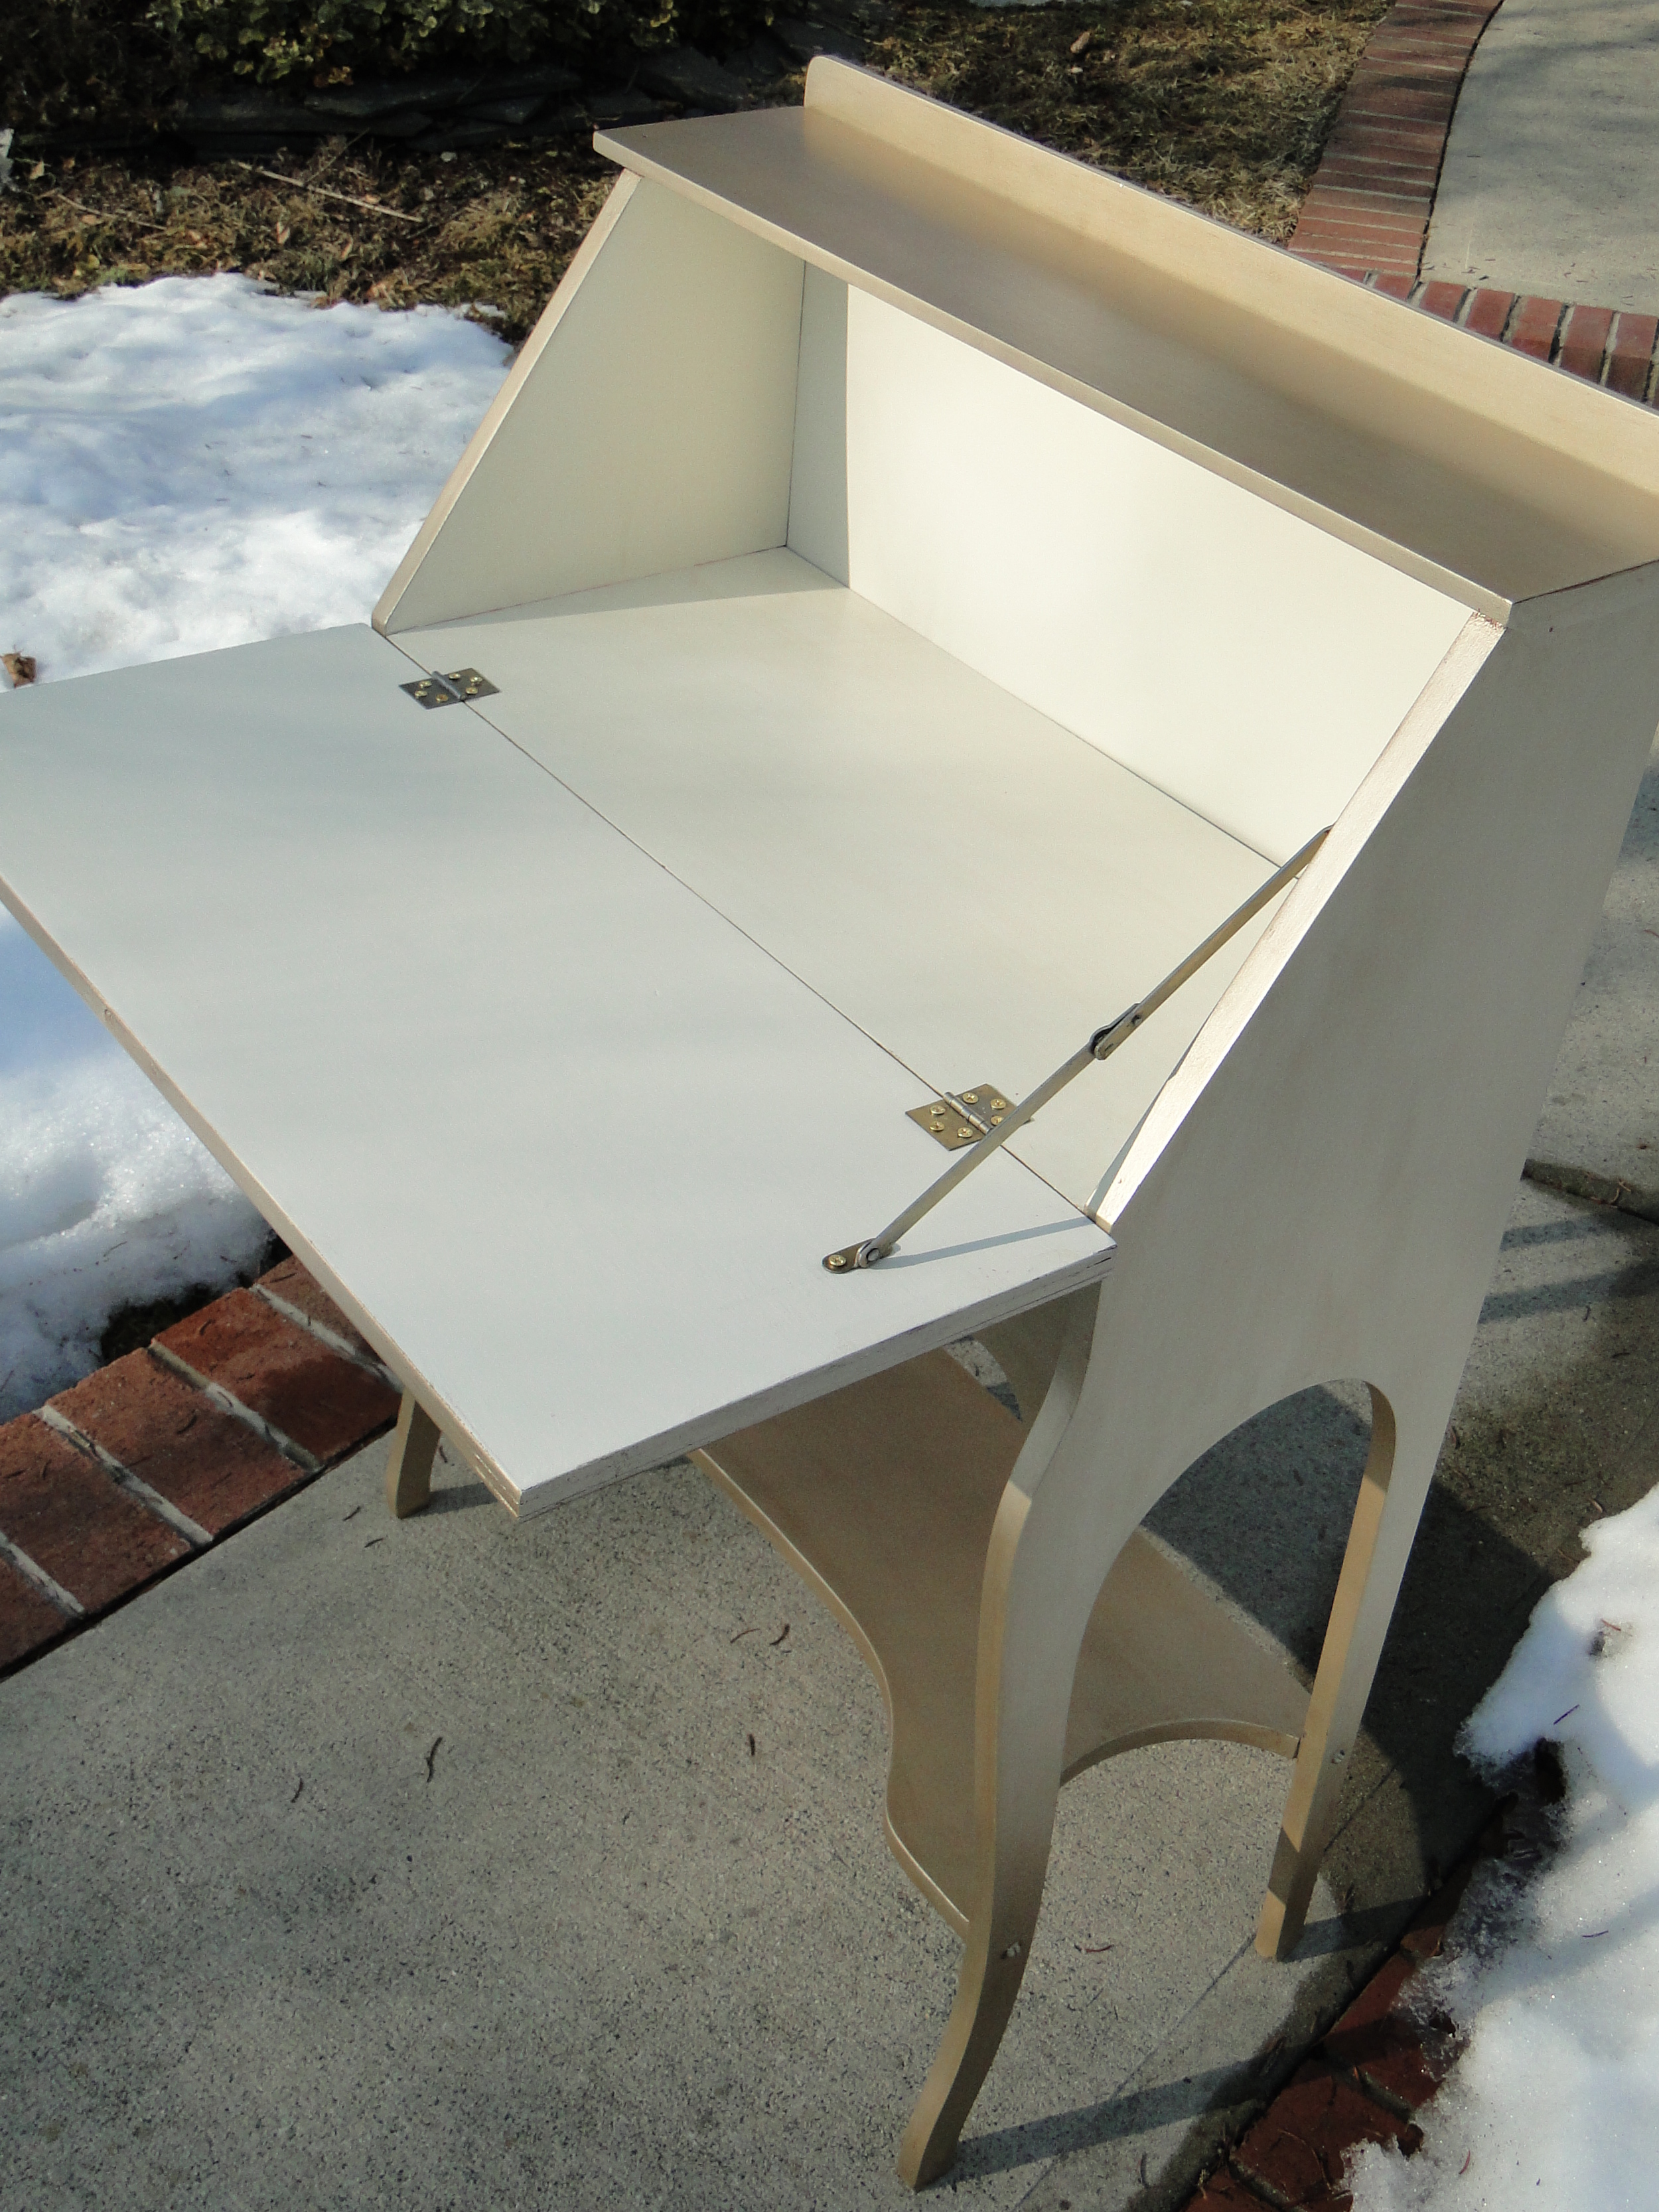 View of interior in creamy off-white